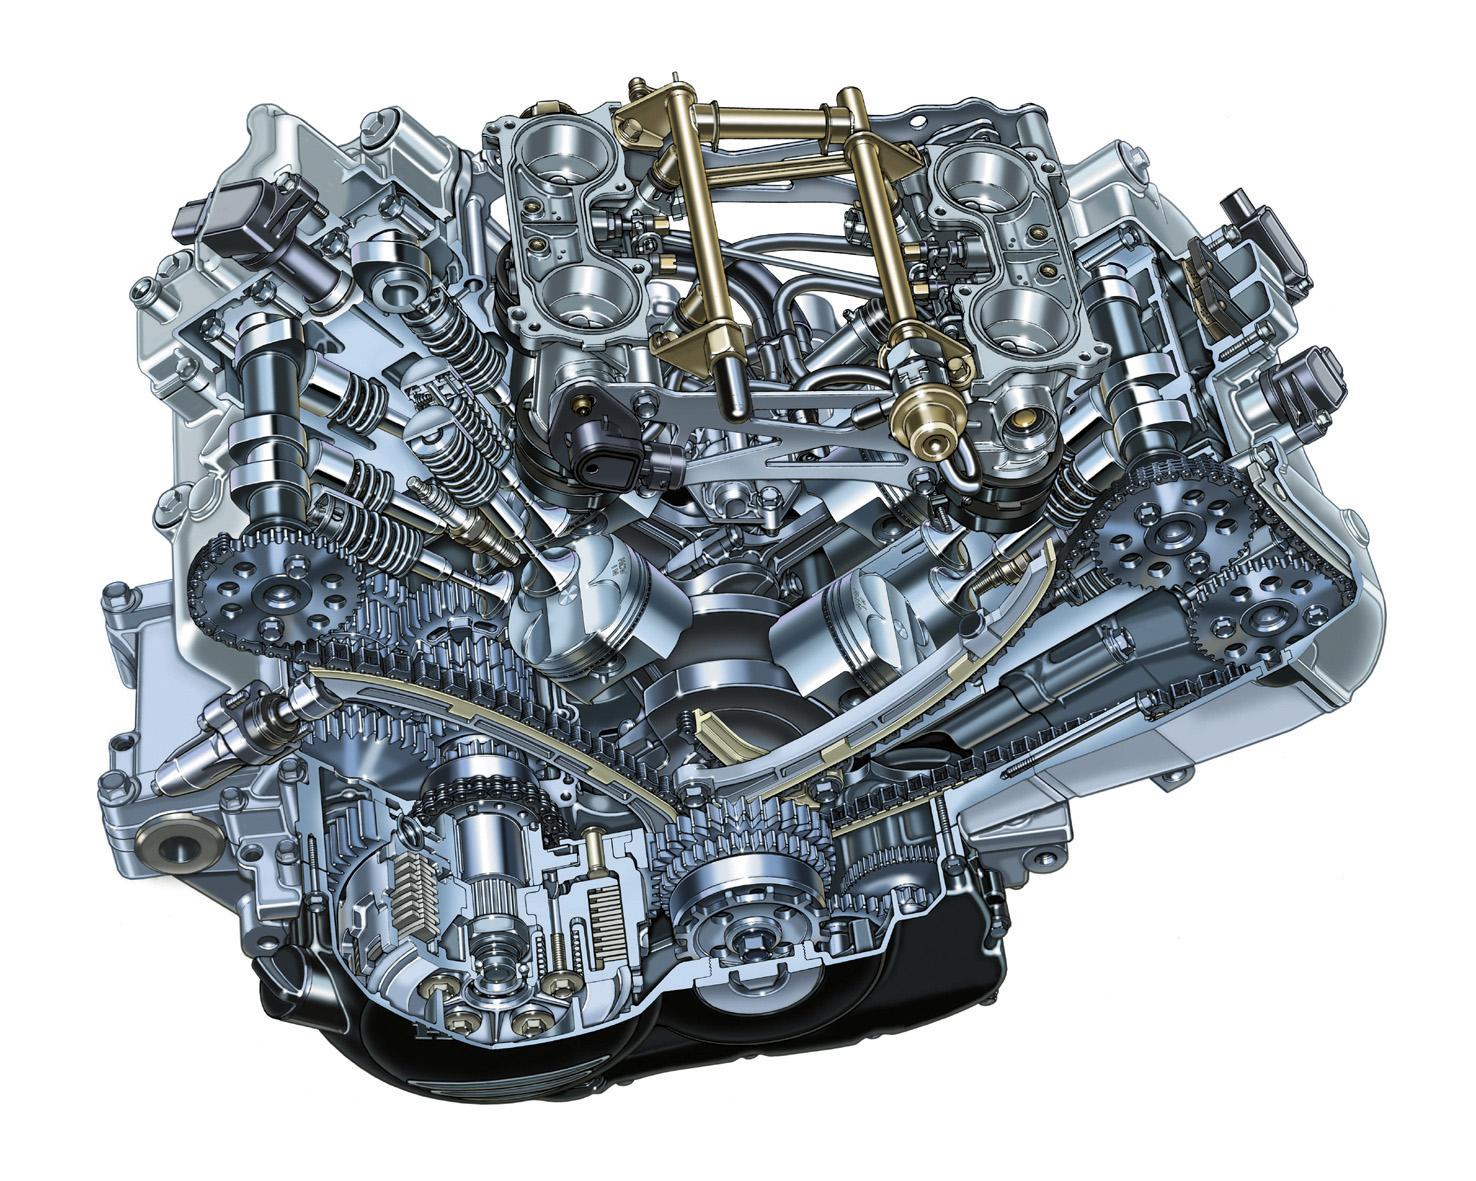 двигатель Хонда ВФР 800